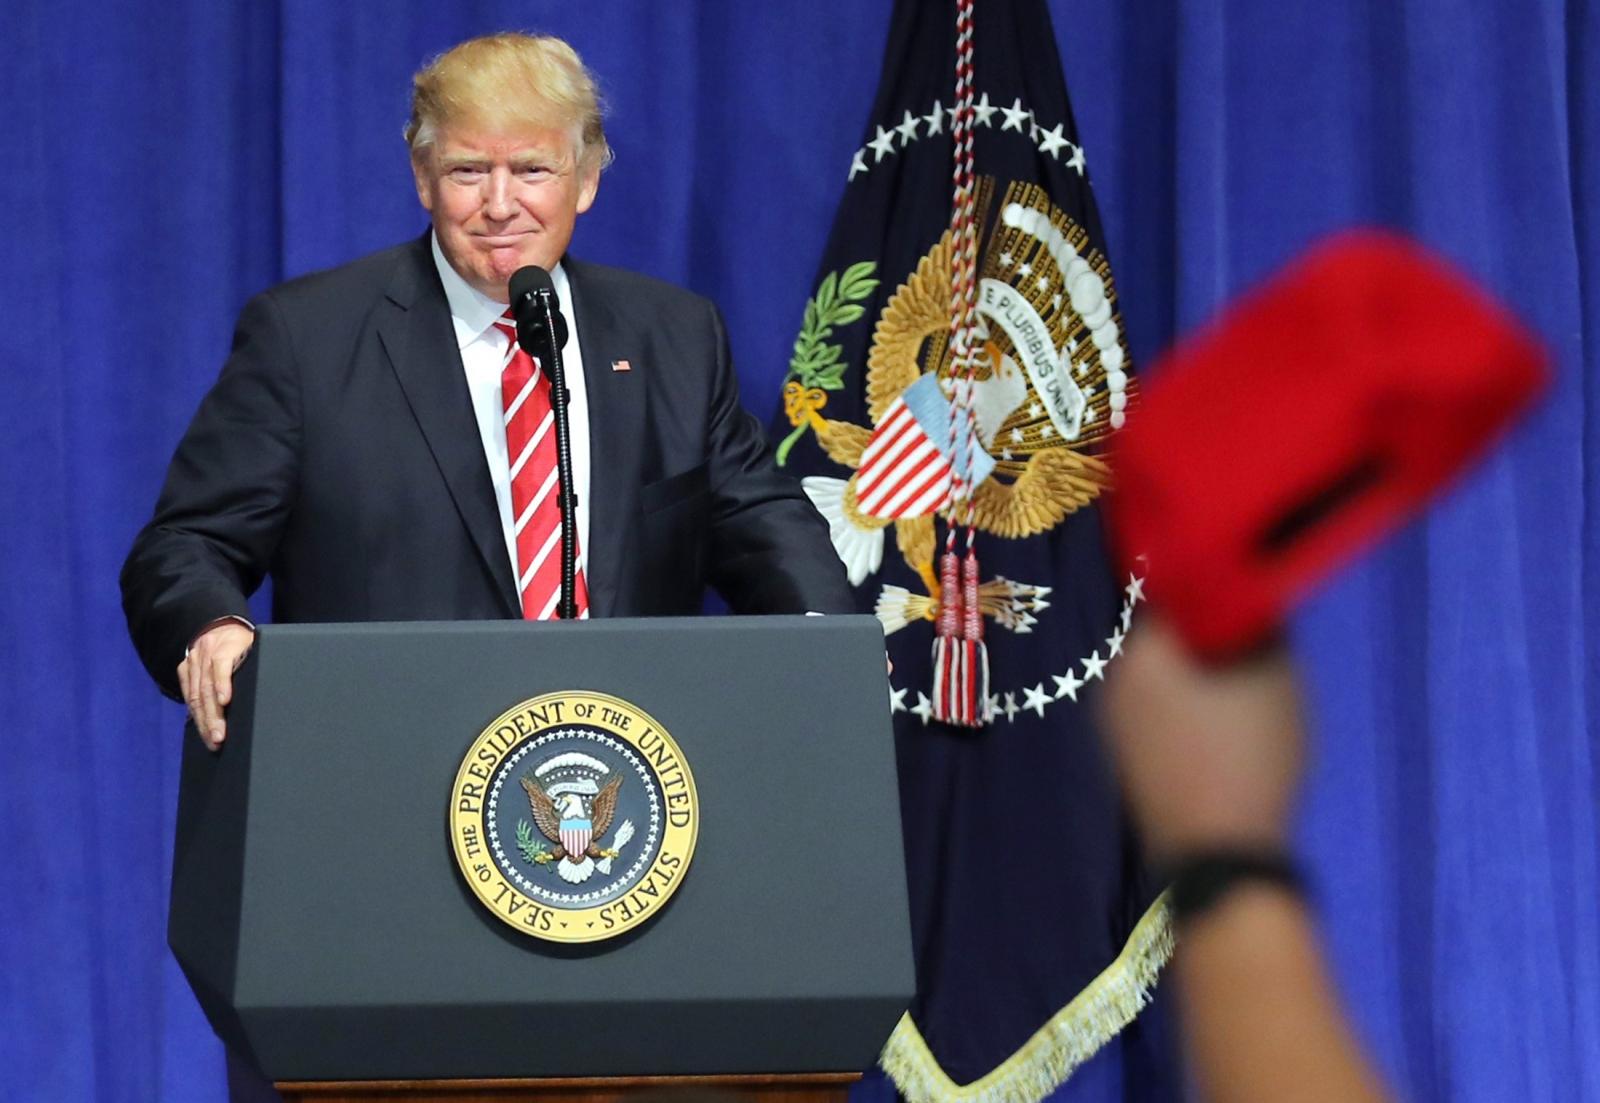 USA-TRUMP/DEFENSE